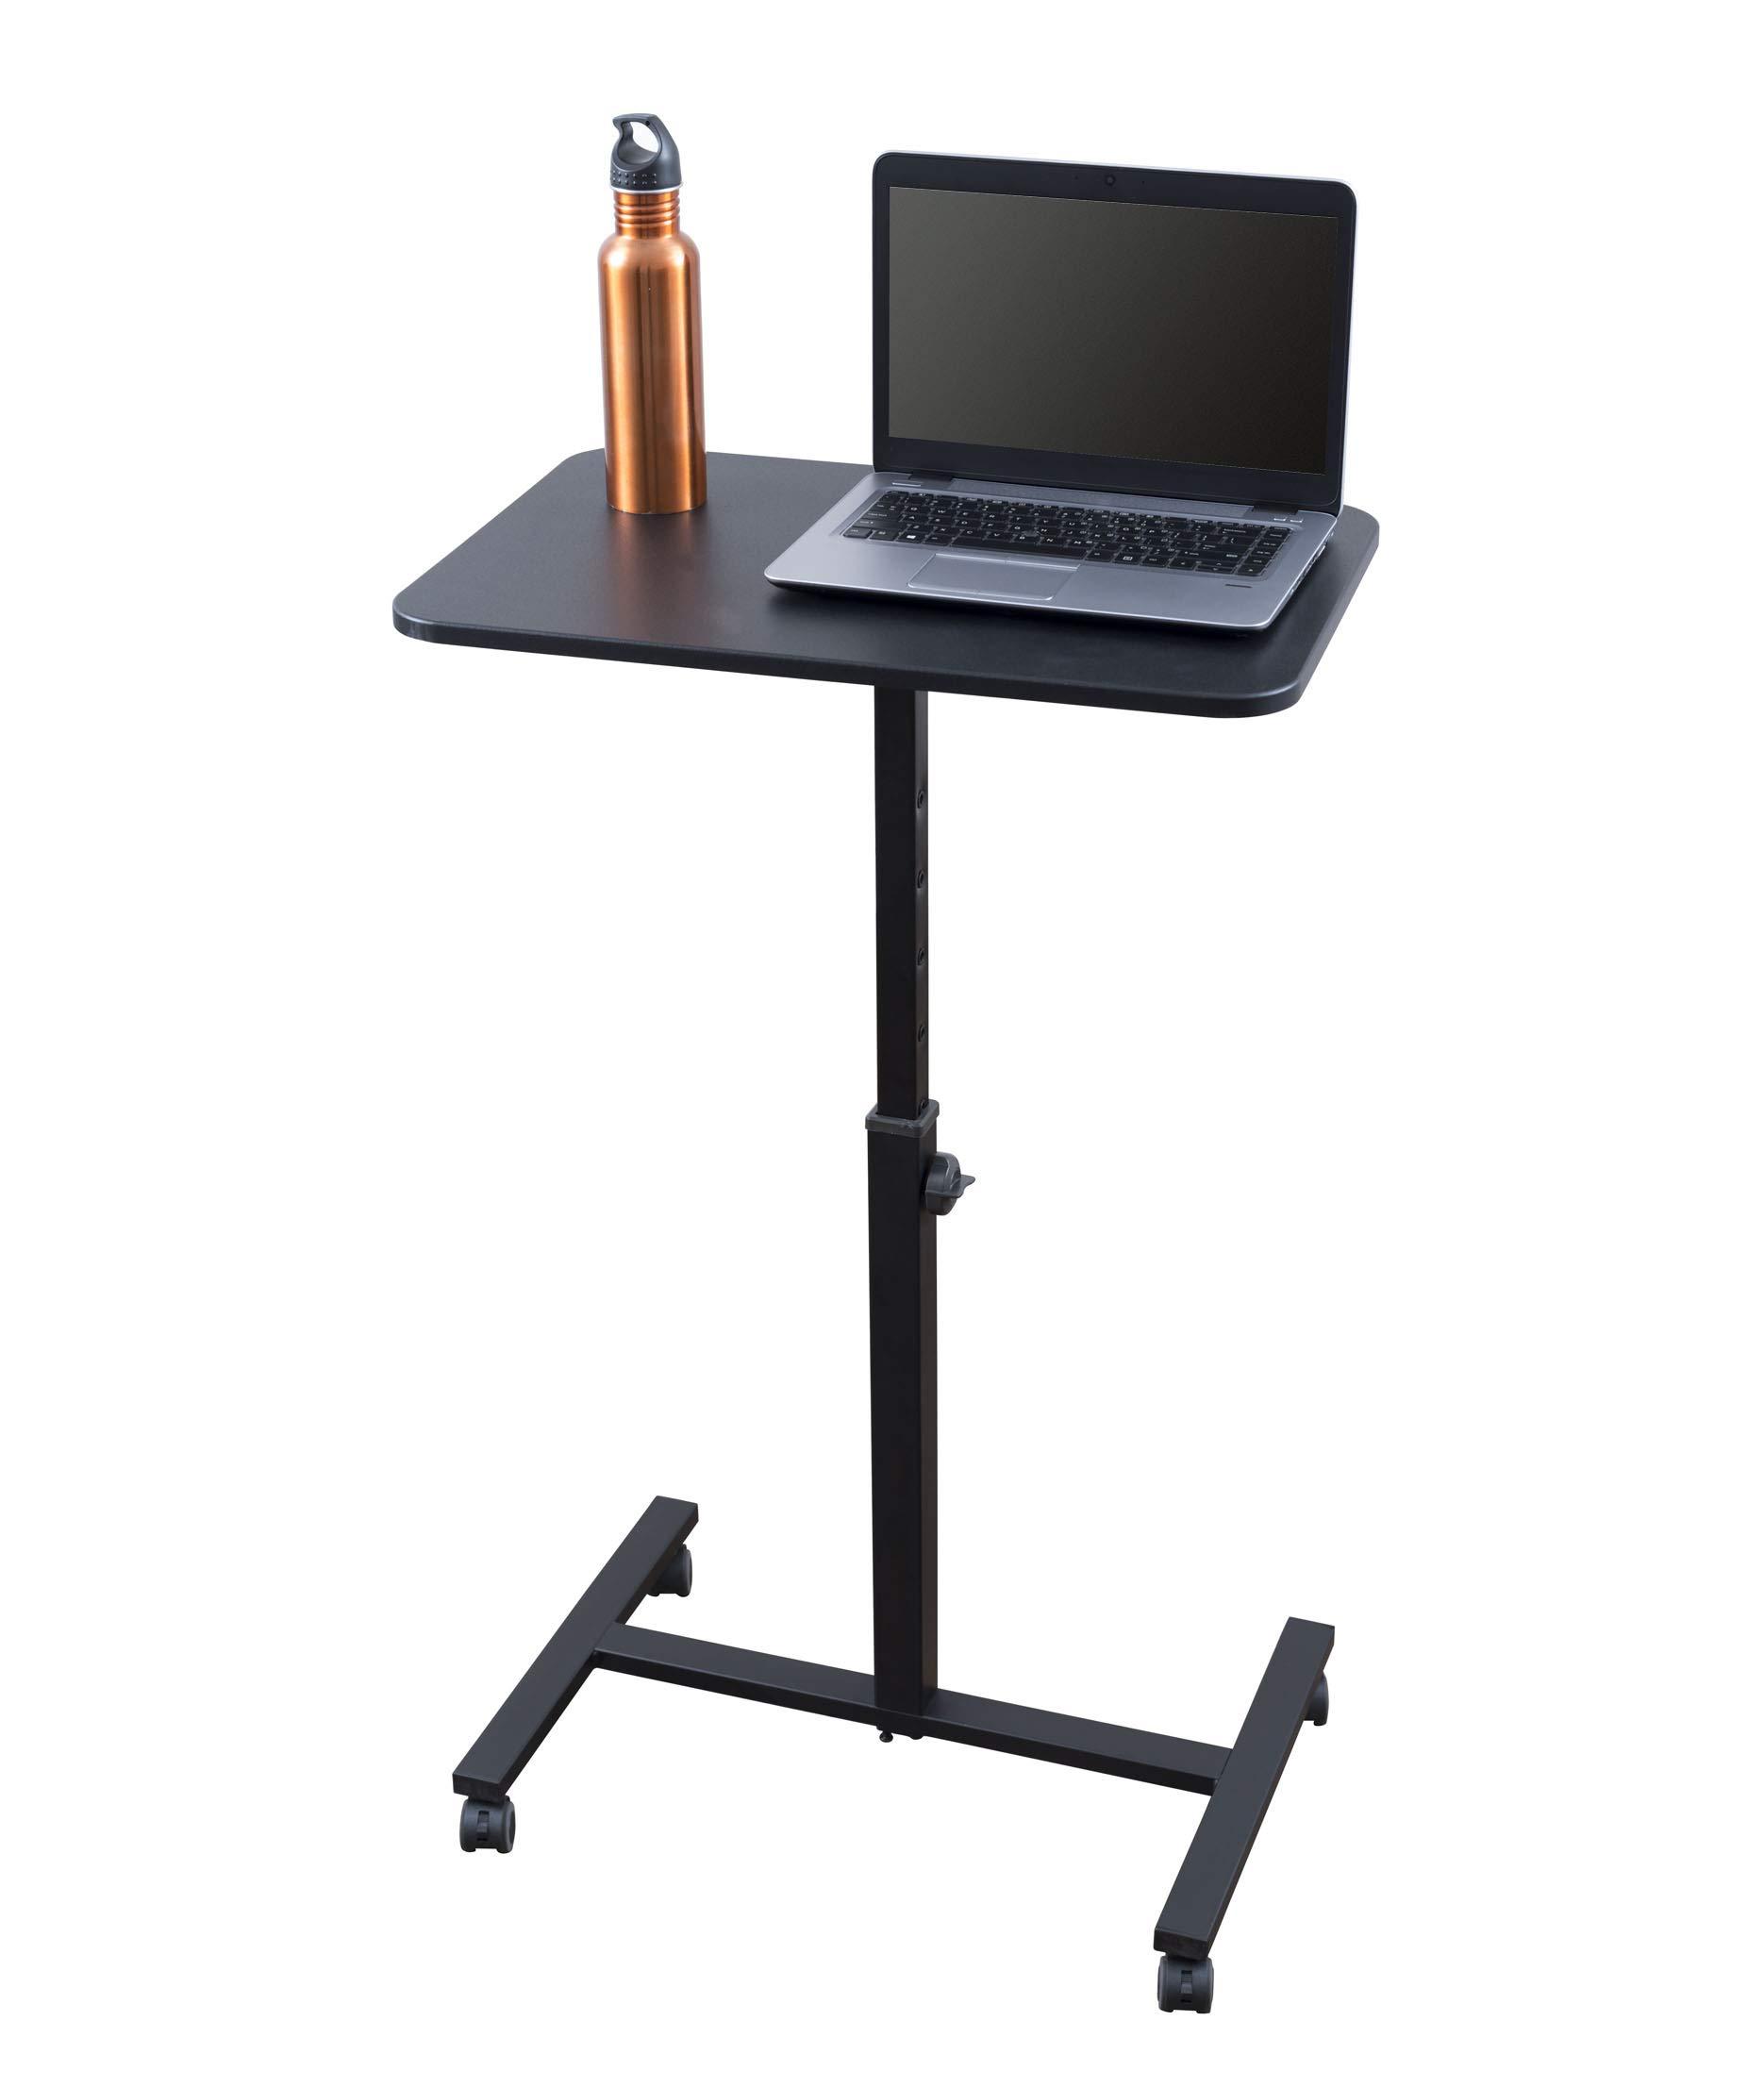 Single Column Standing Desk Stand